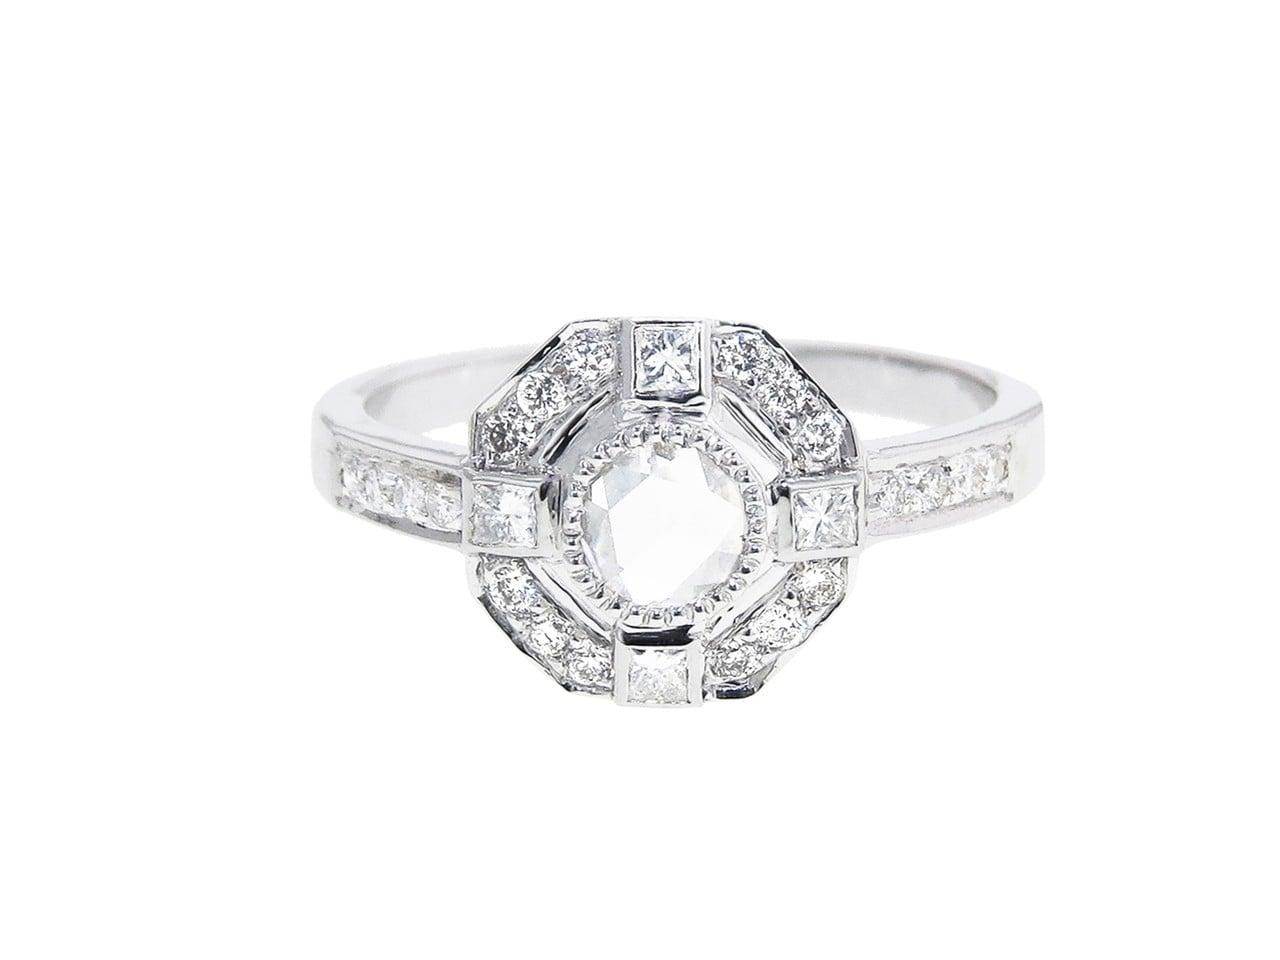 Sethi Couture Rose-Cut Antique Ring ($2,250)